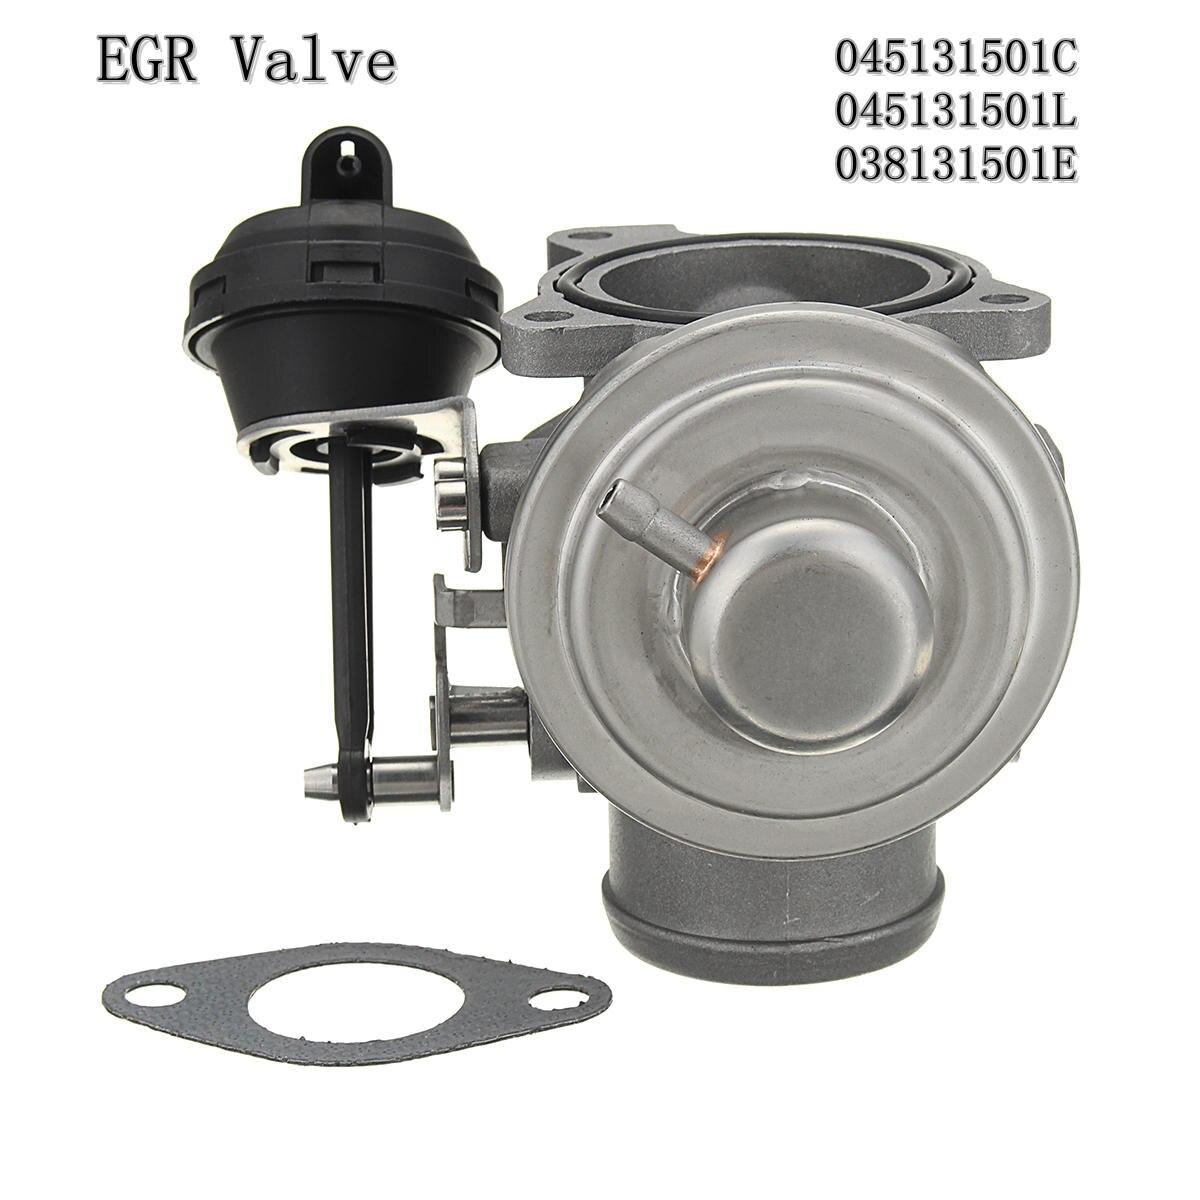 EGR Valve Exhaust Gas Recirculation Valve for Volkswagen Golf IV Passat 1.9 TDi 1997 2006 045131501C 045131501L 038131501E